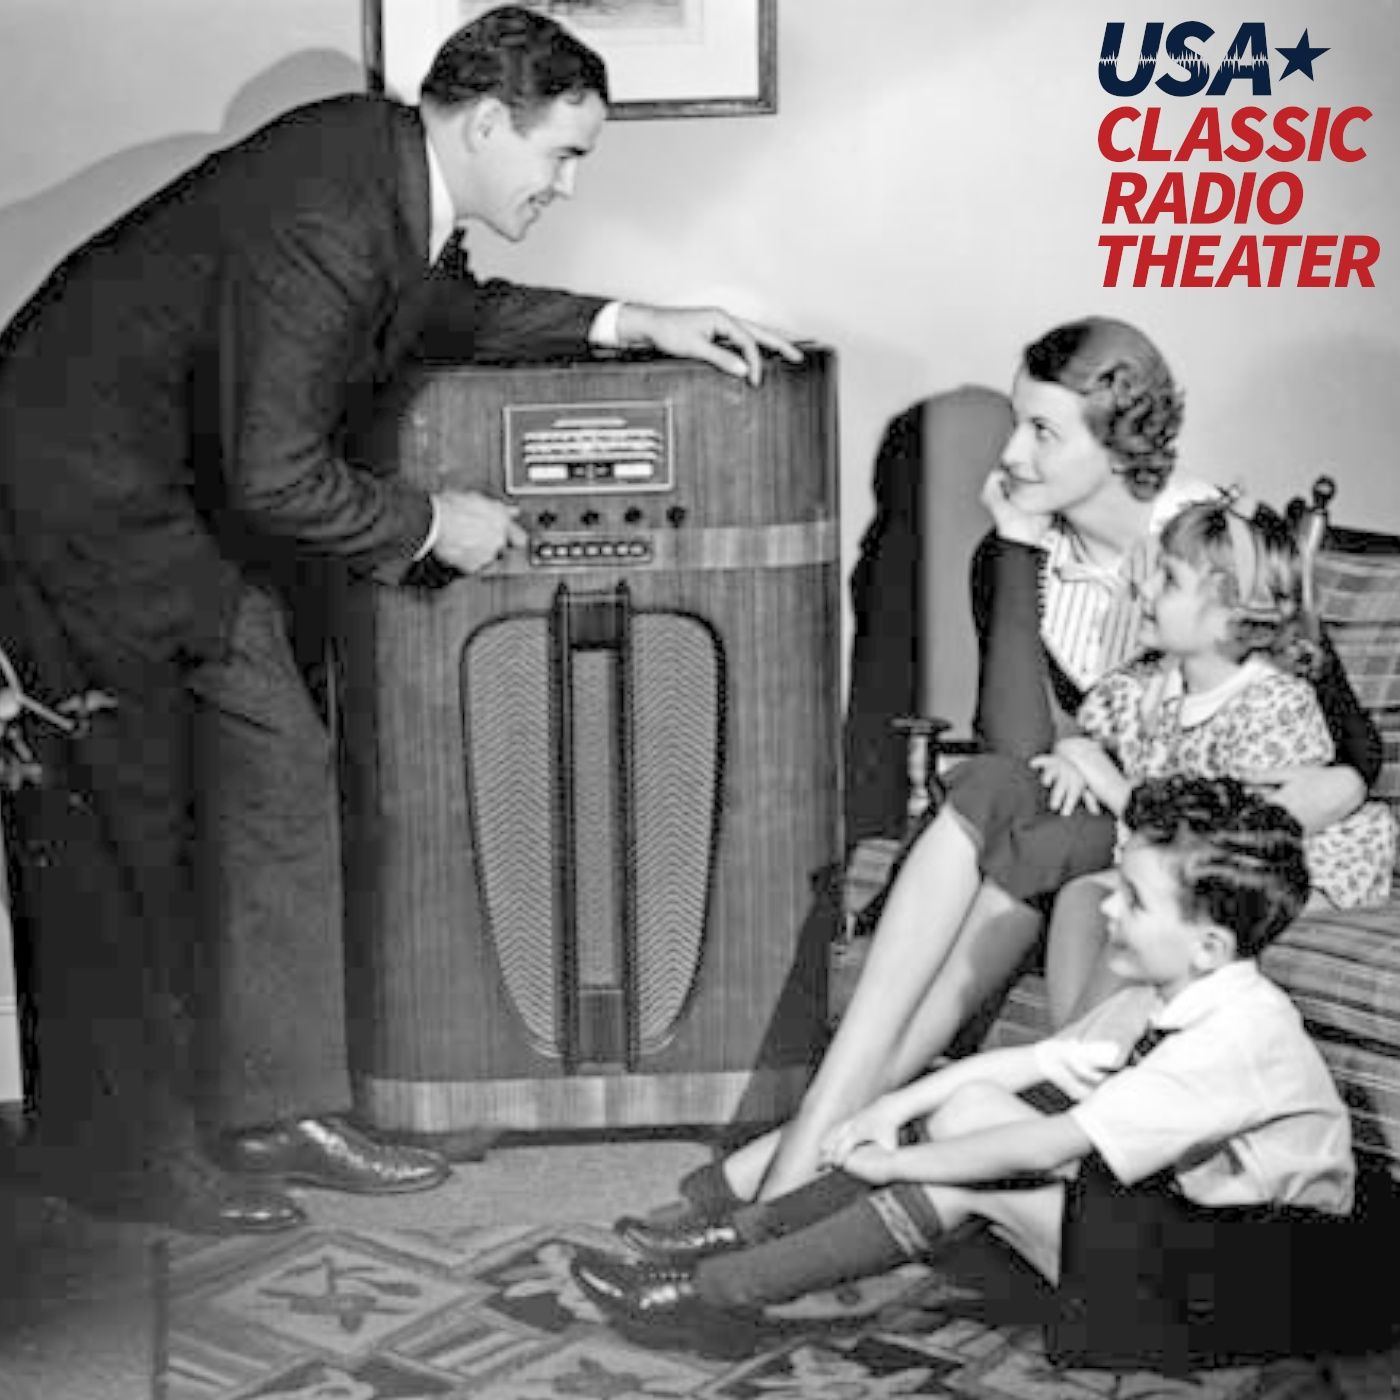 USA Classic Radio Theater